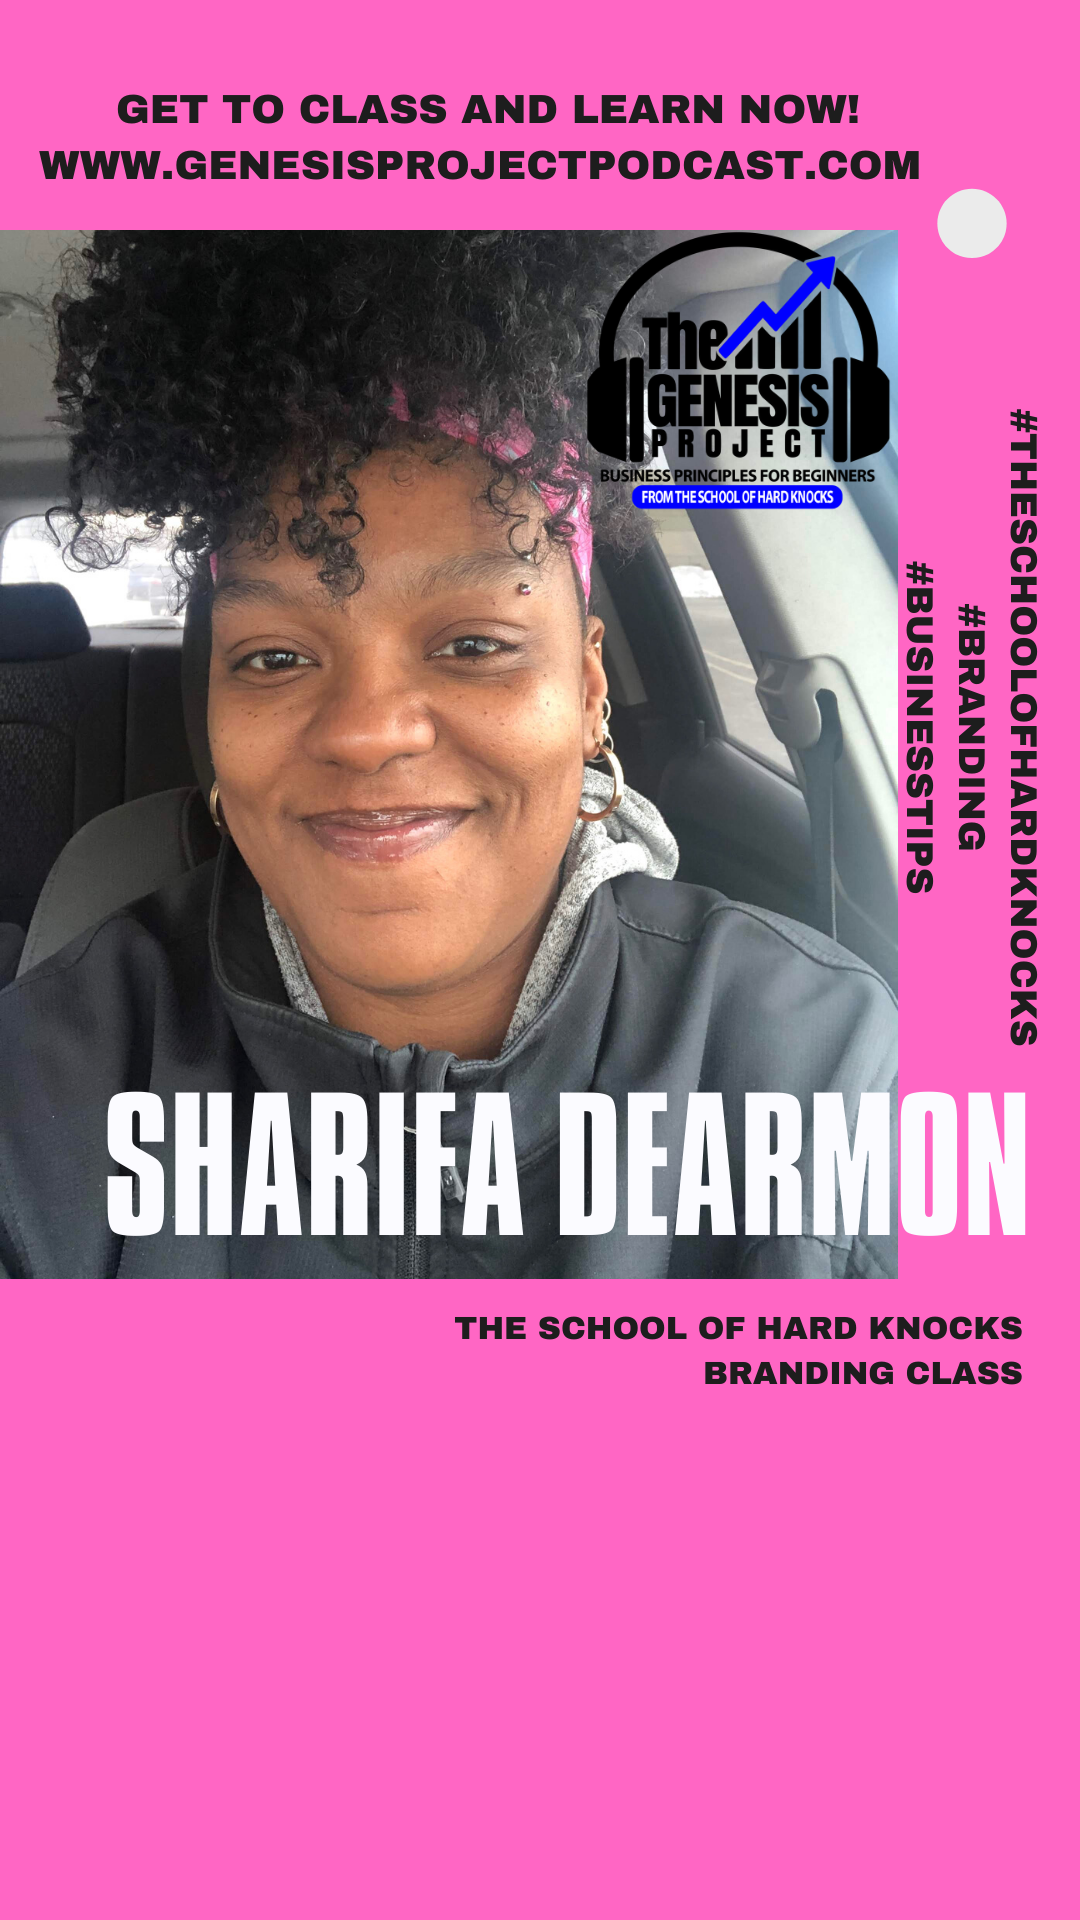 Guest Professor Sharifa DeArmon